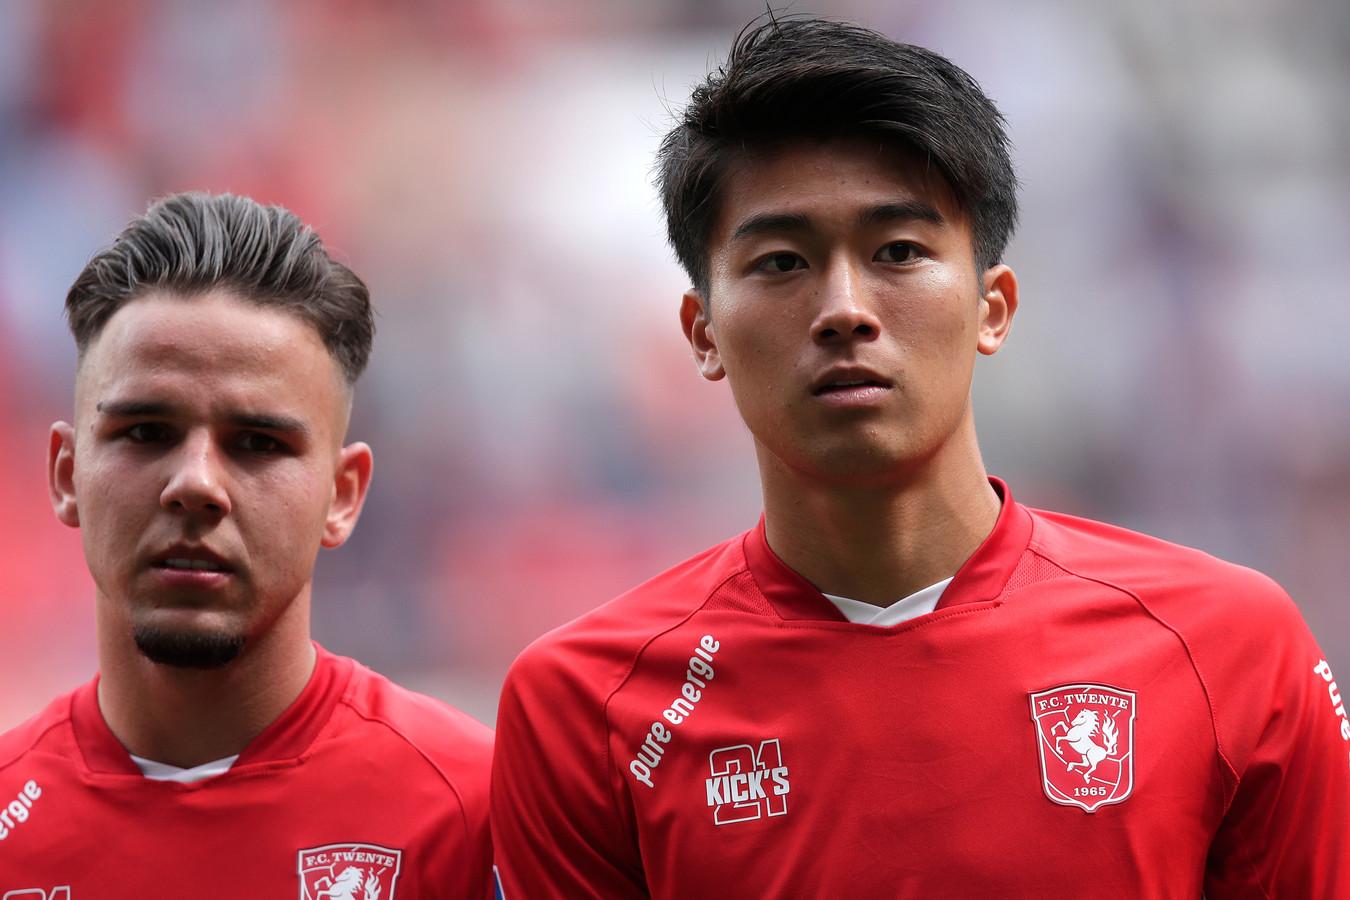 Twee nieuwkomers bij FC Twente: Calvin Verdonk en Keito Nakamura.